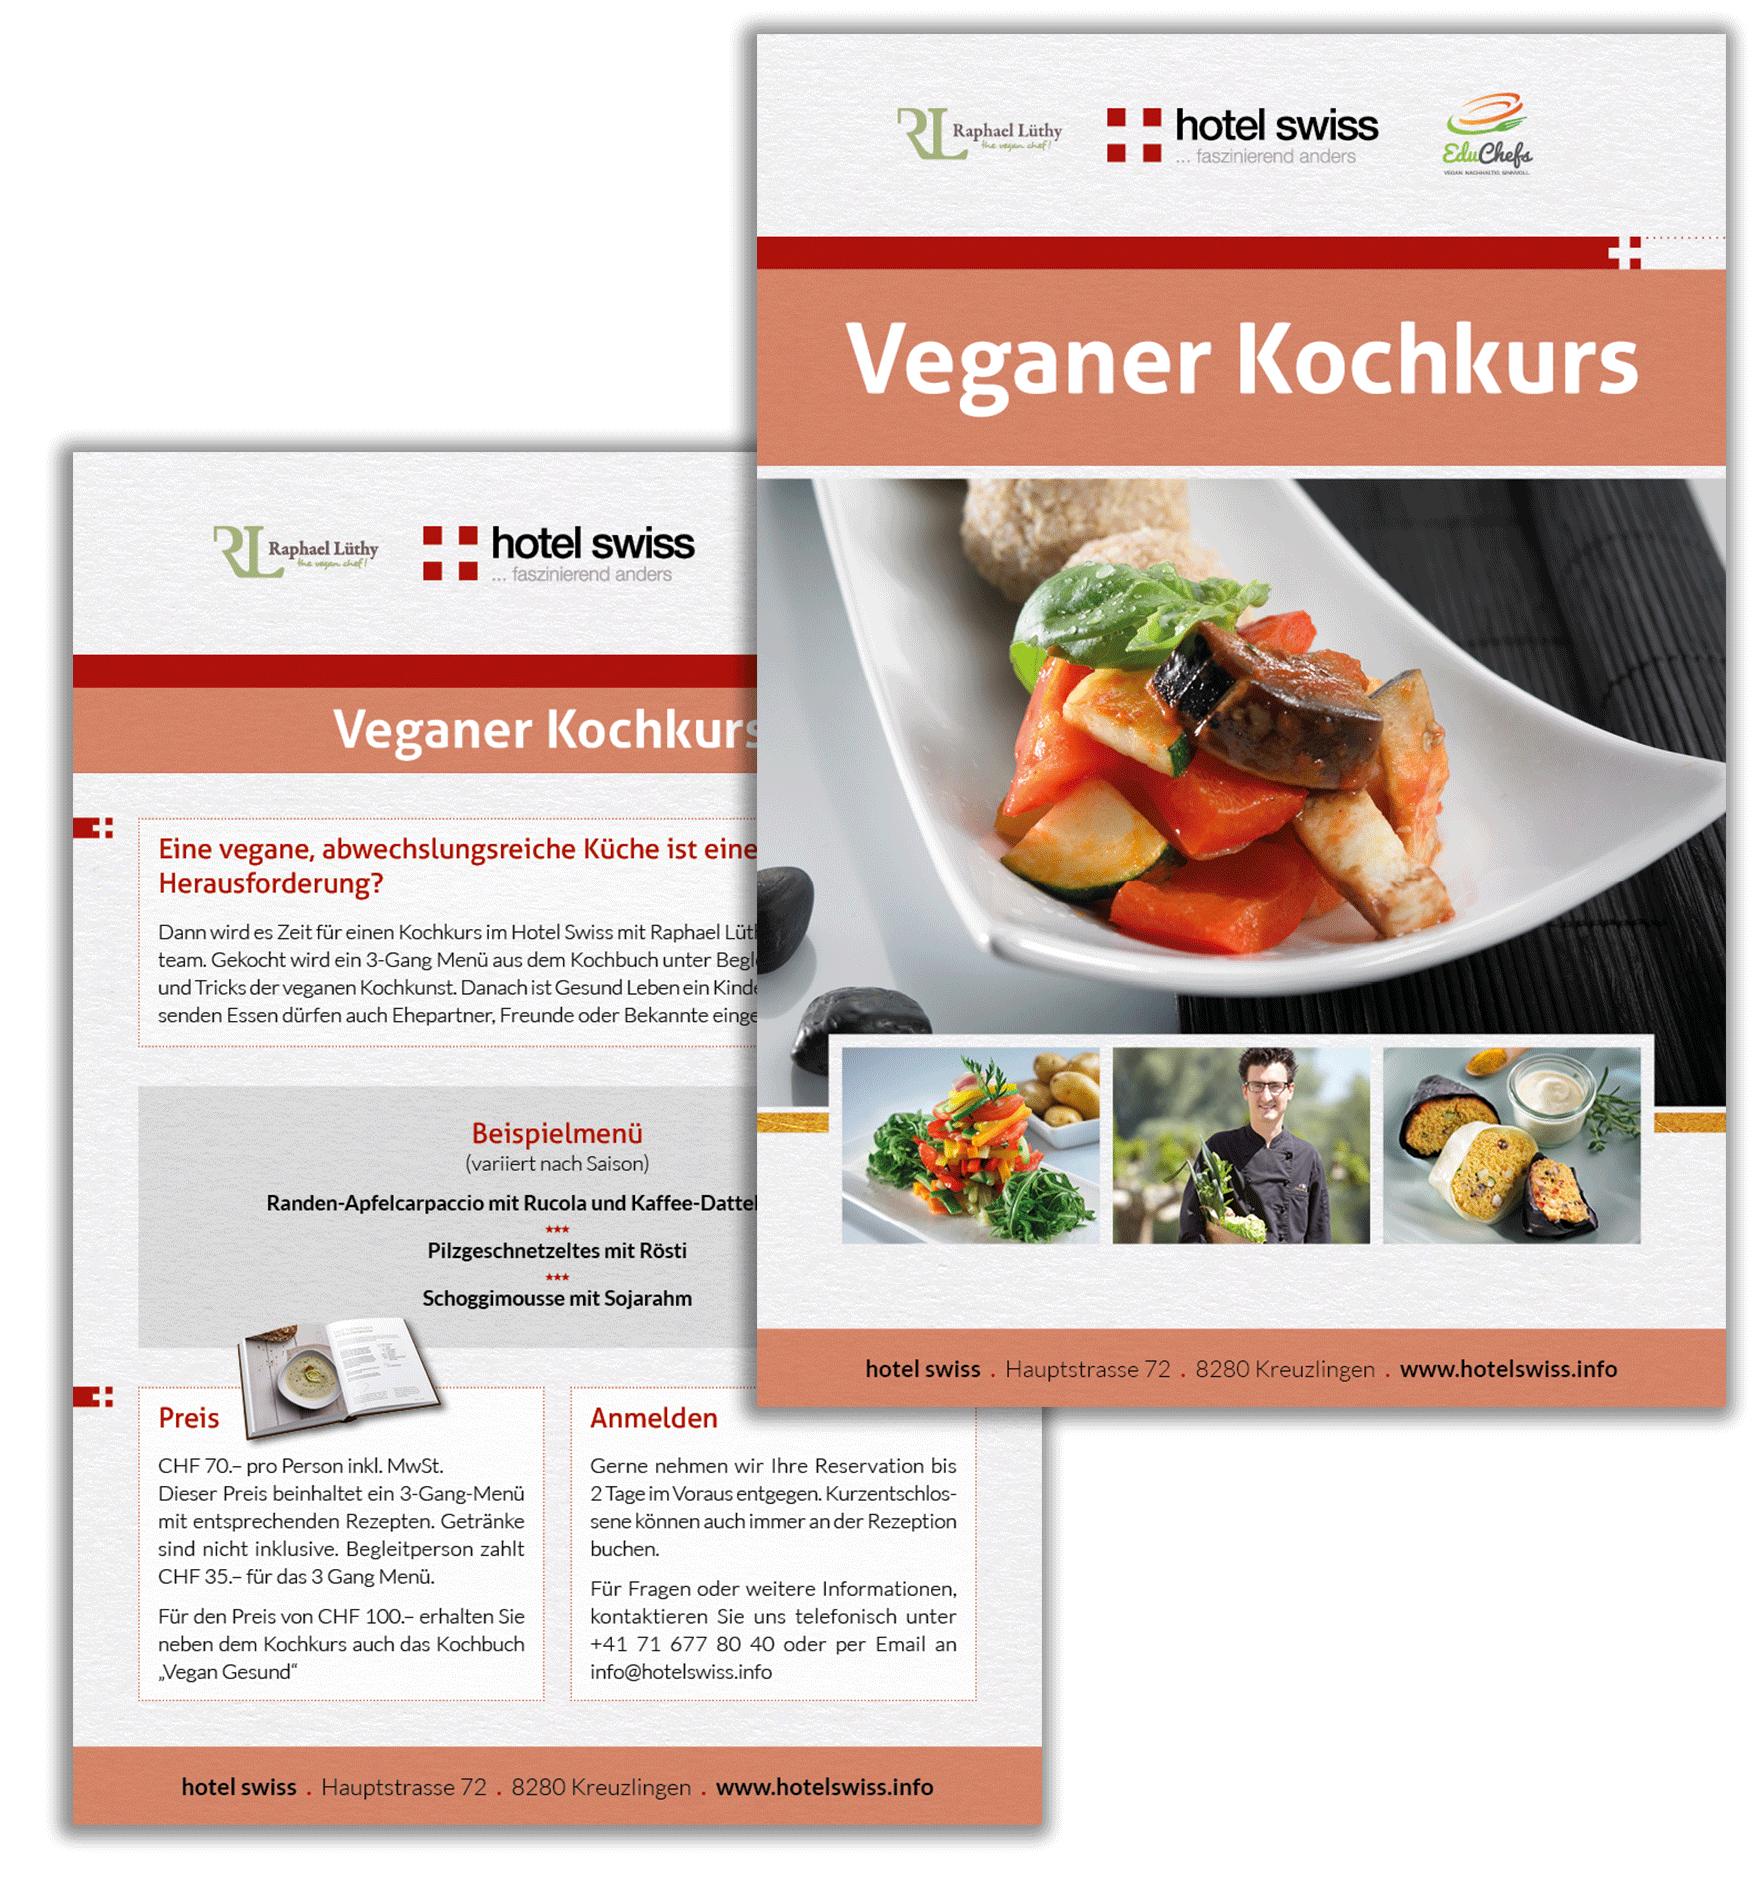 Kochkurse - The Vegan Chef